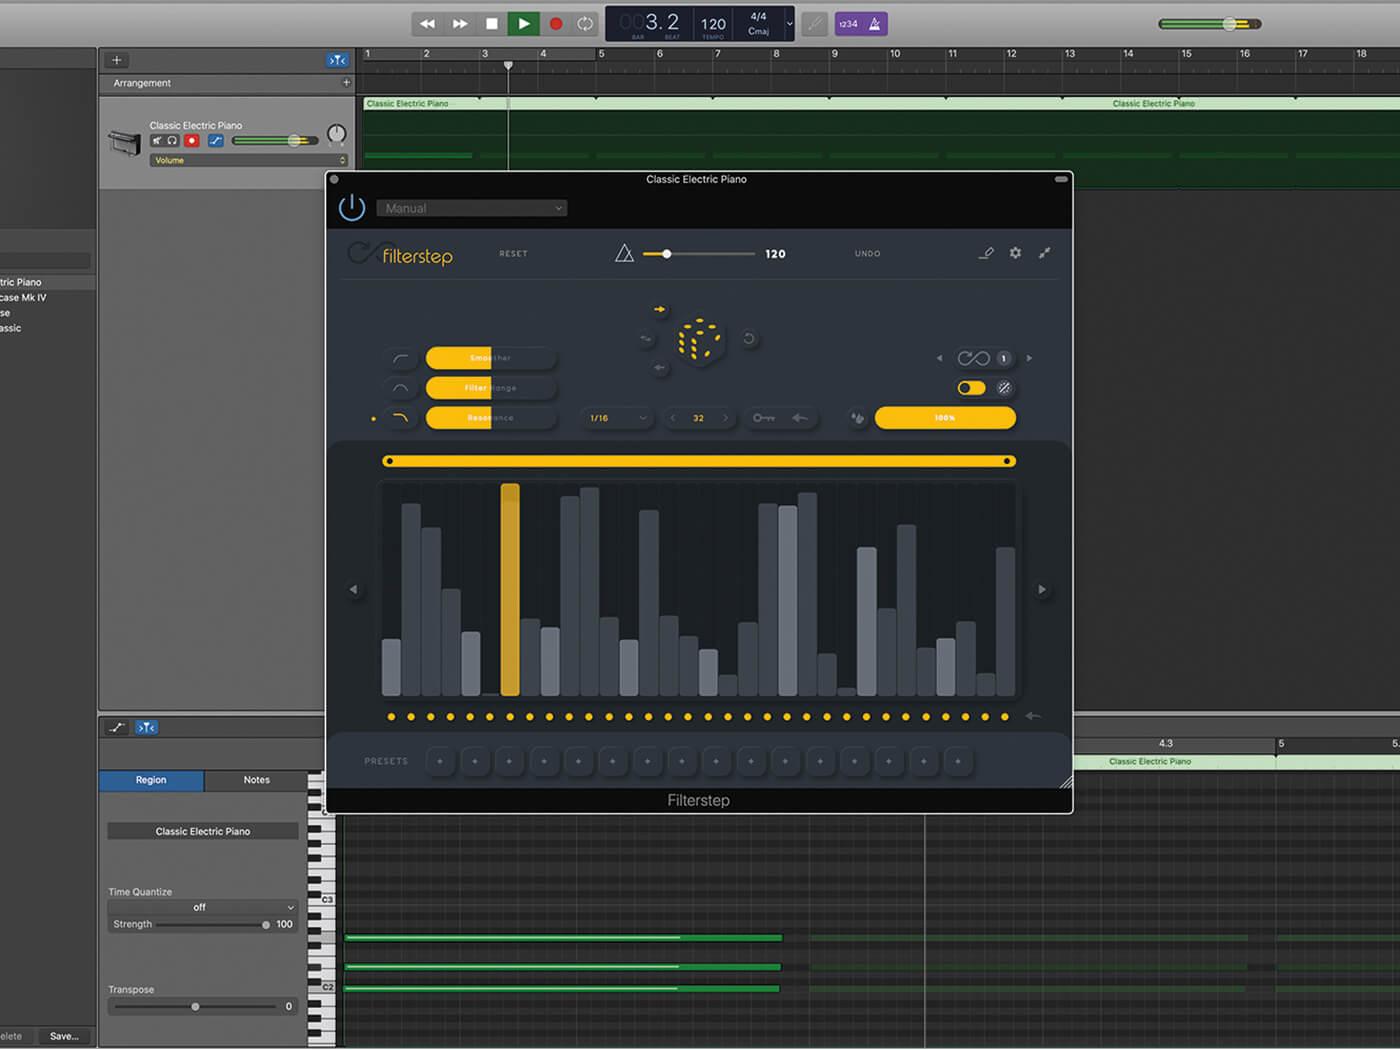 Audiomodern Filterstep